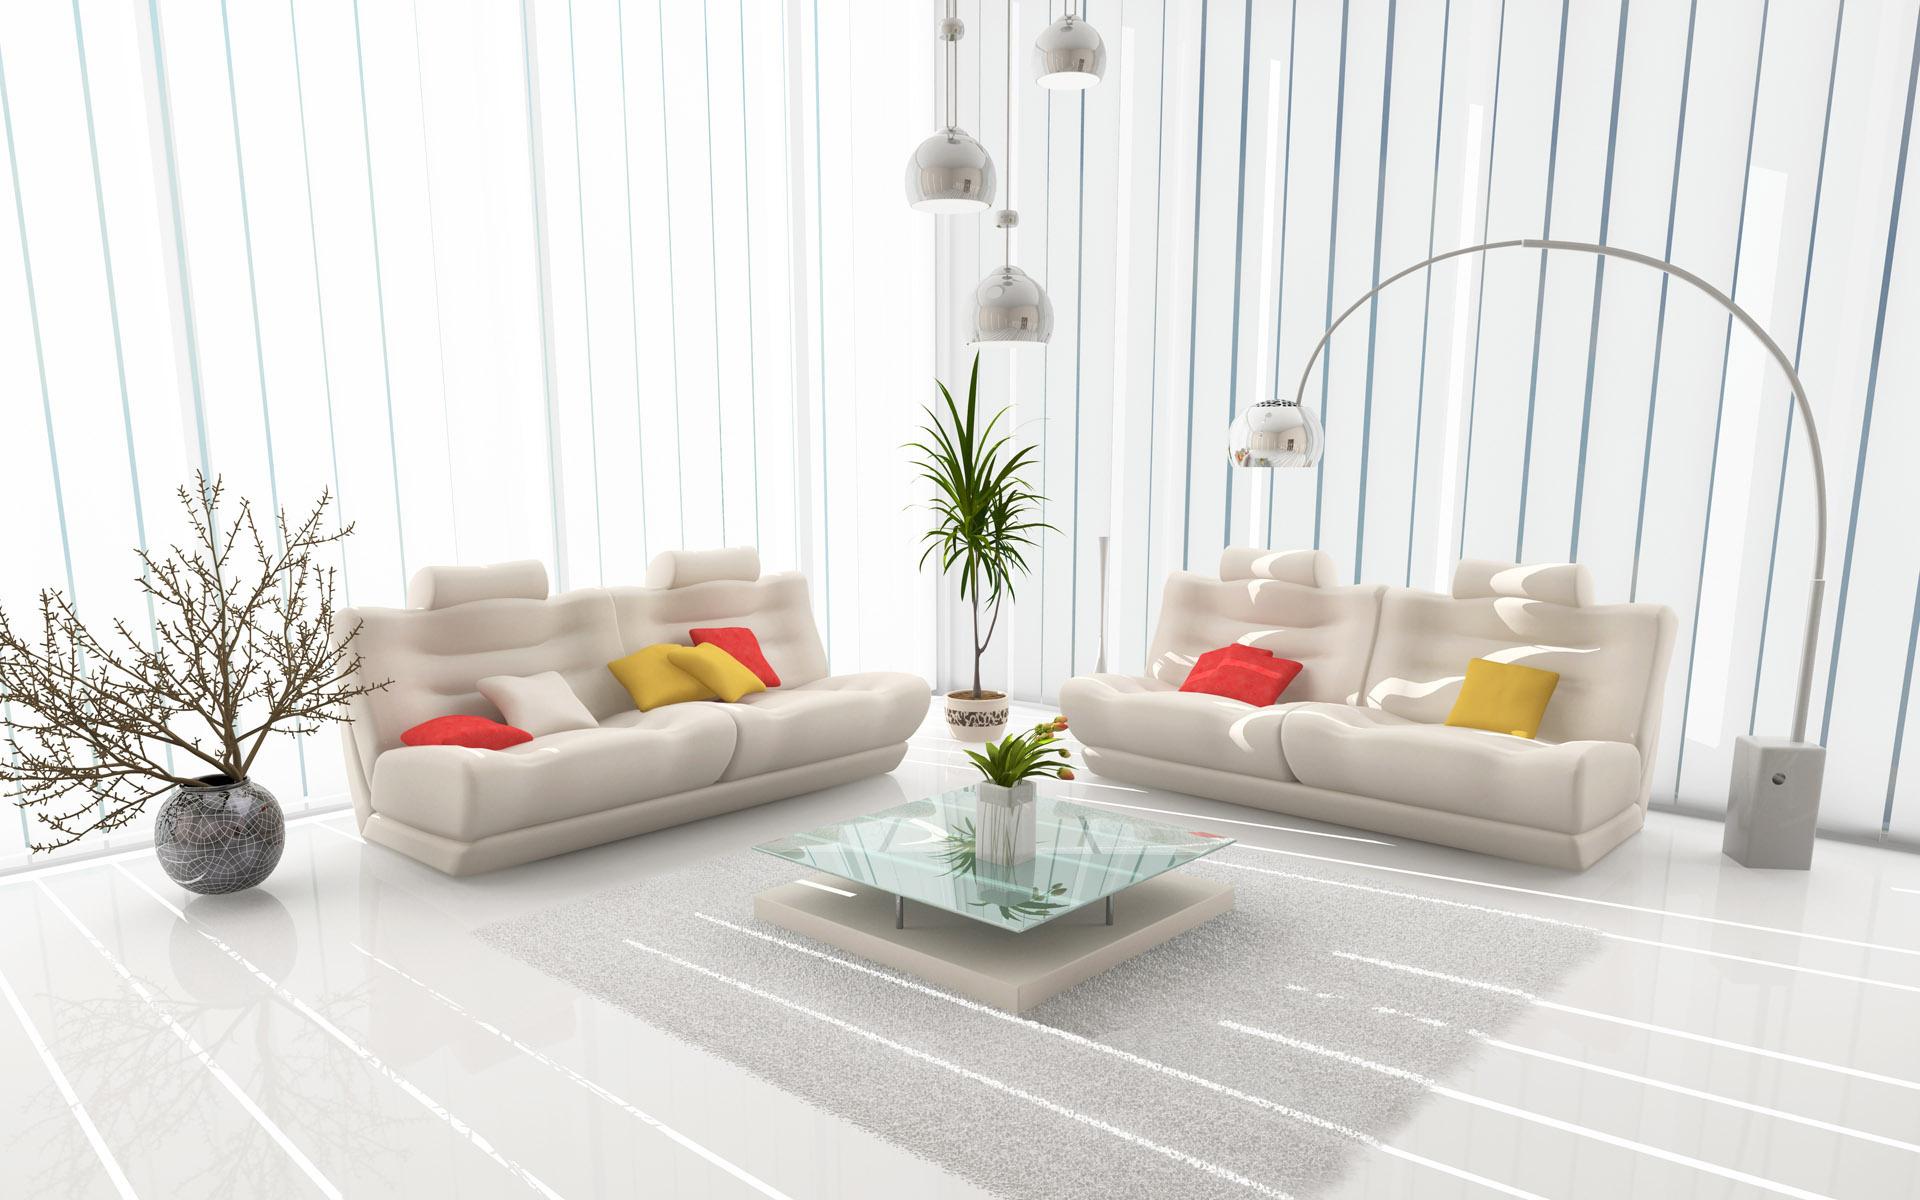 интерьер диван комната  № 3531361 загрузить